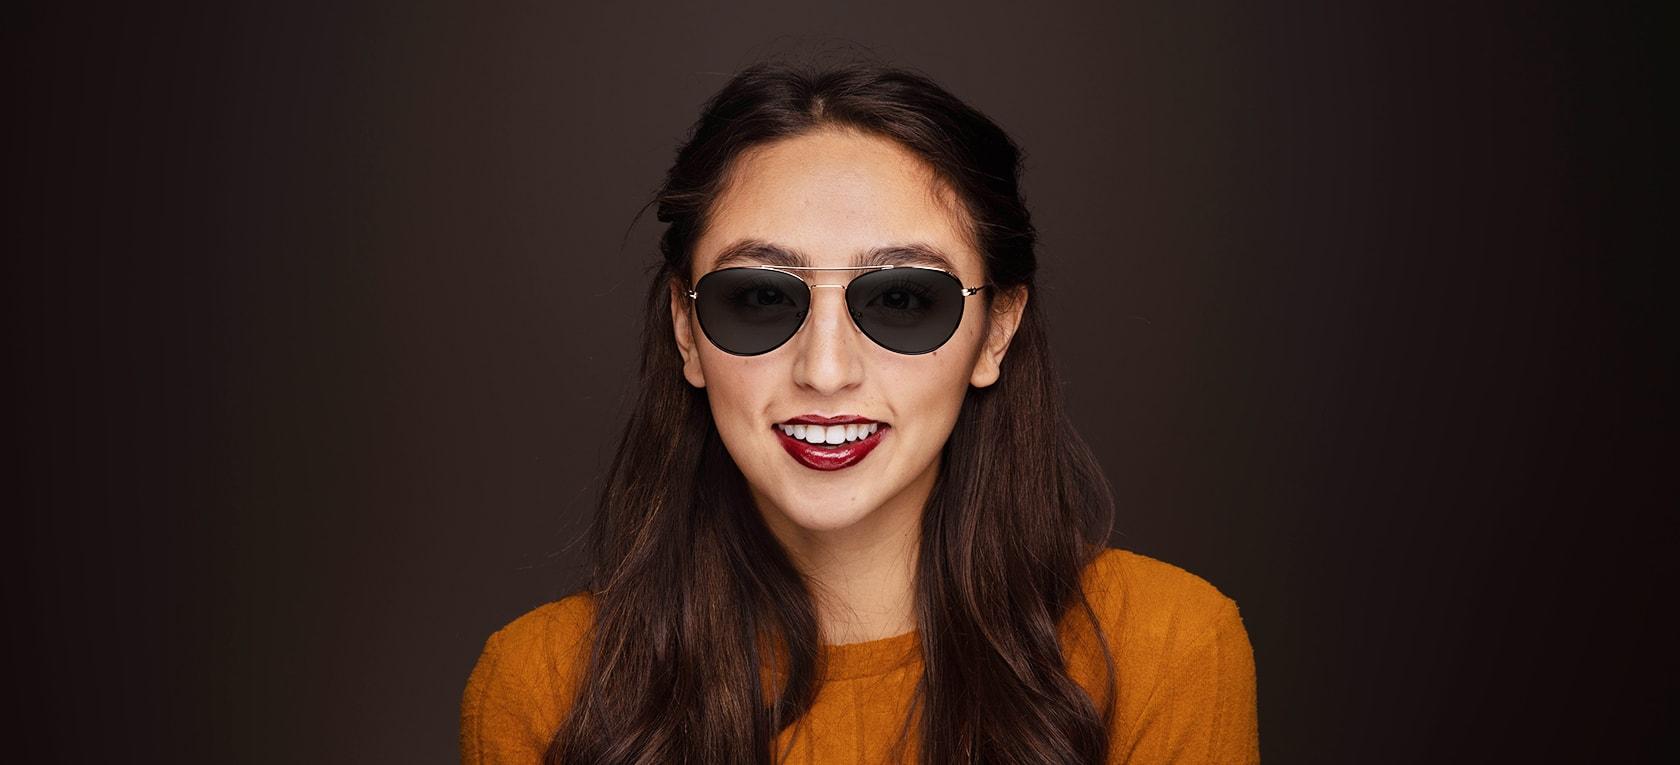 Image of model wearing Ruby frames